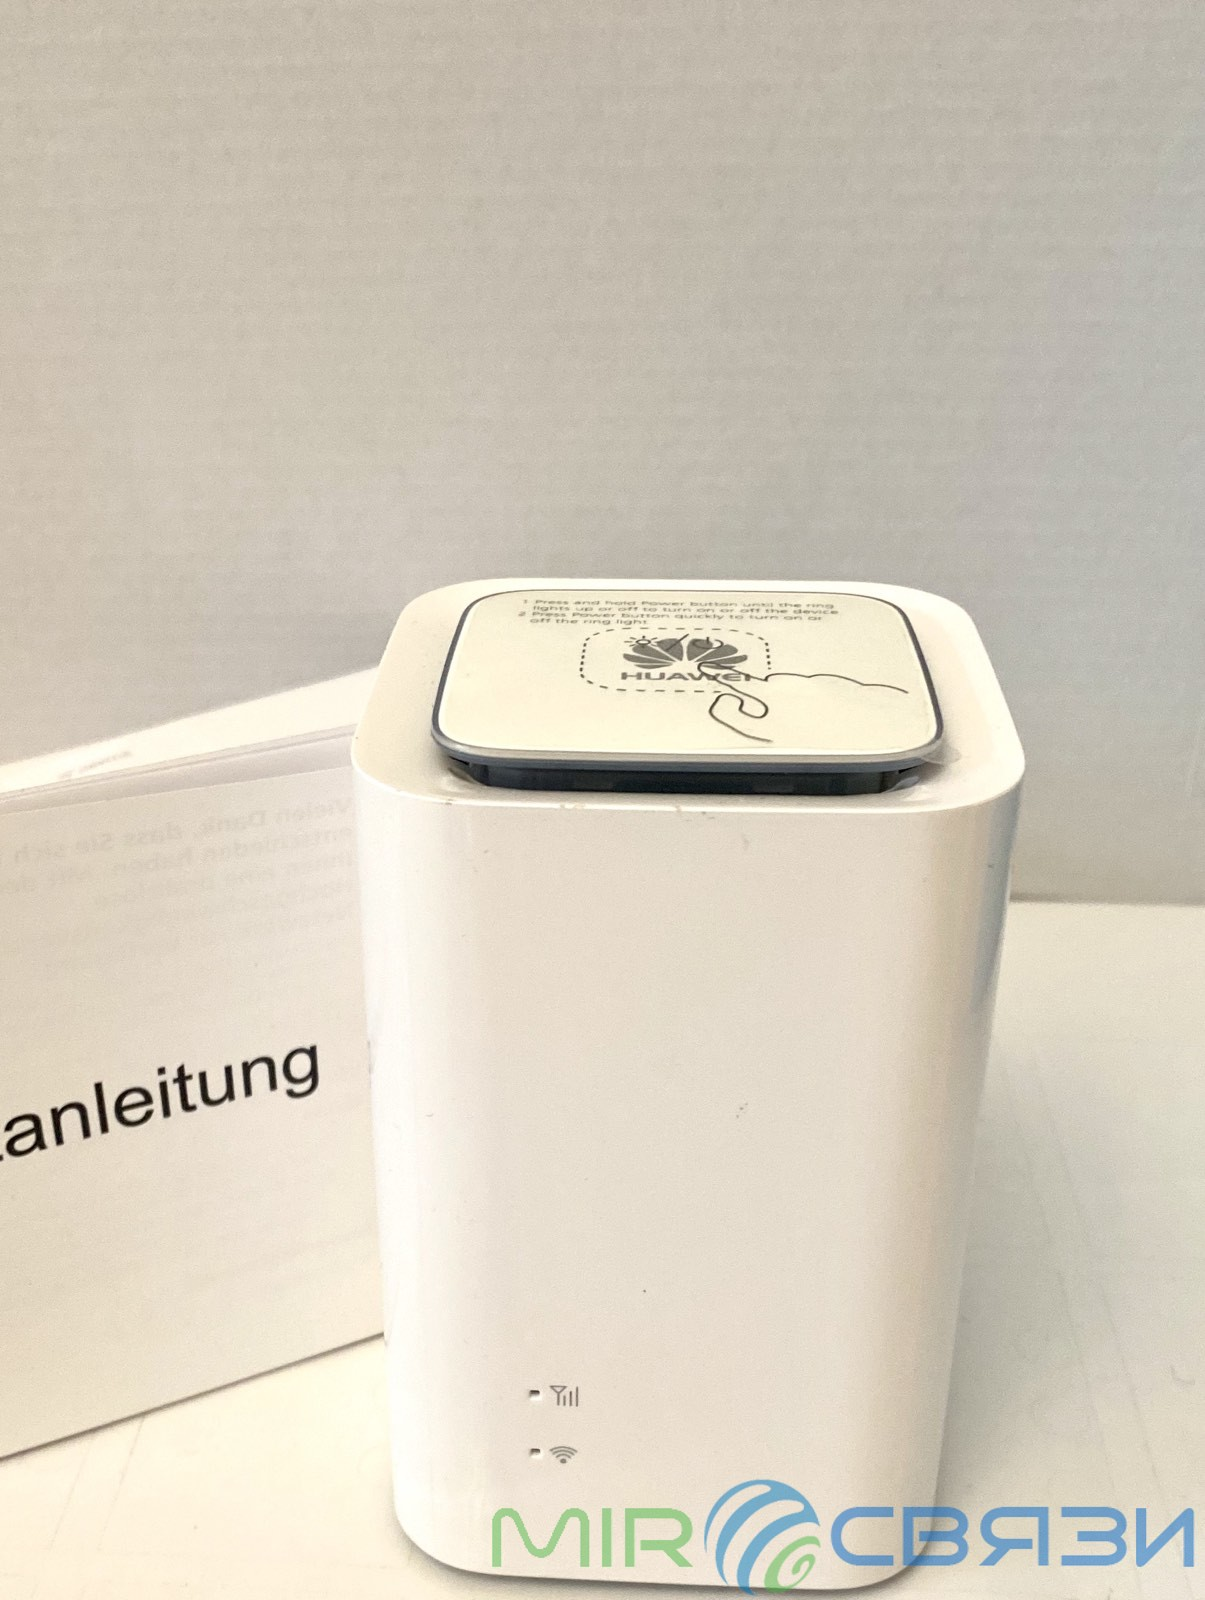 Huawei E5180s-22 Стационарный 3G/4G LTE Wi-Fi роутер